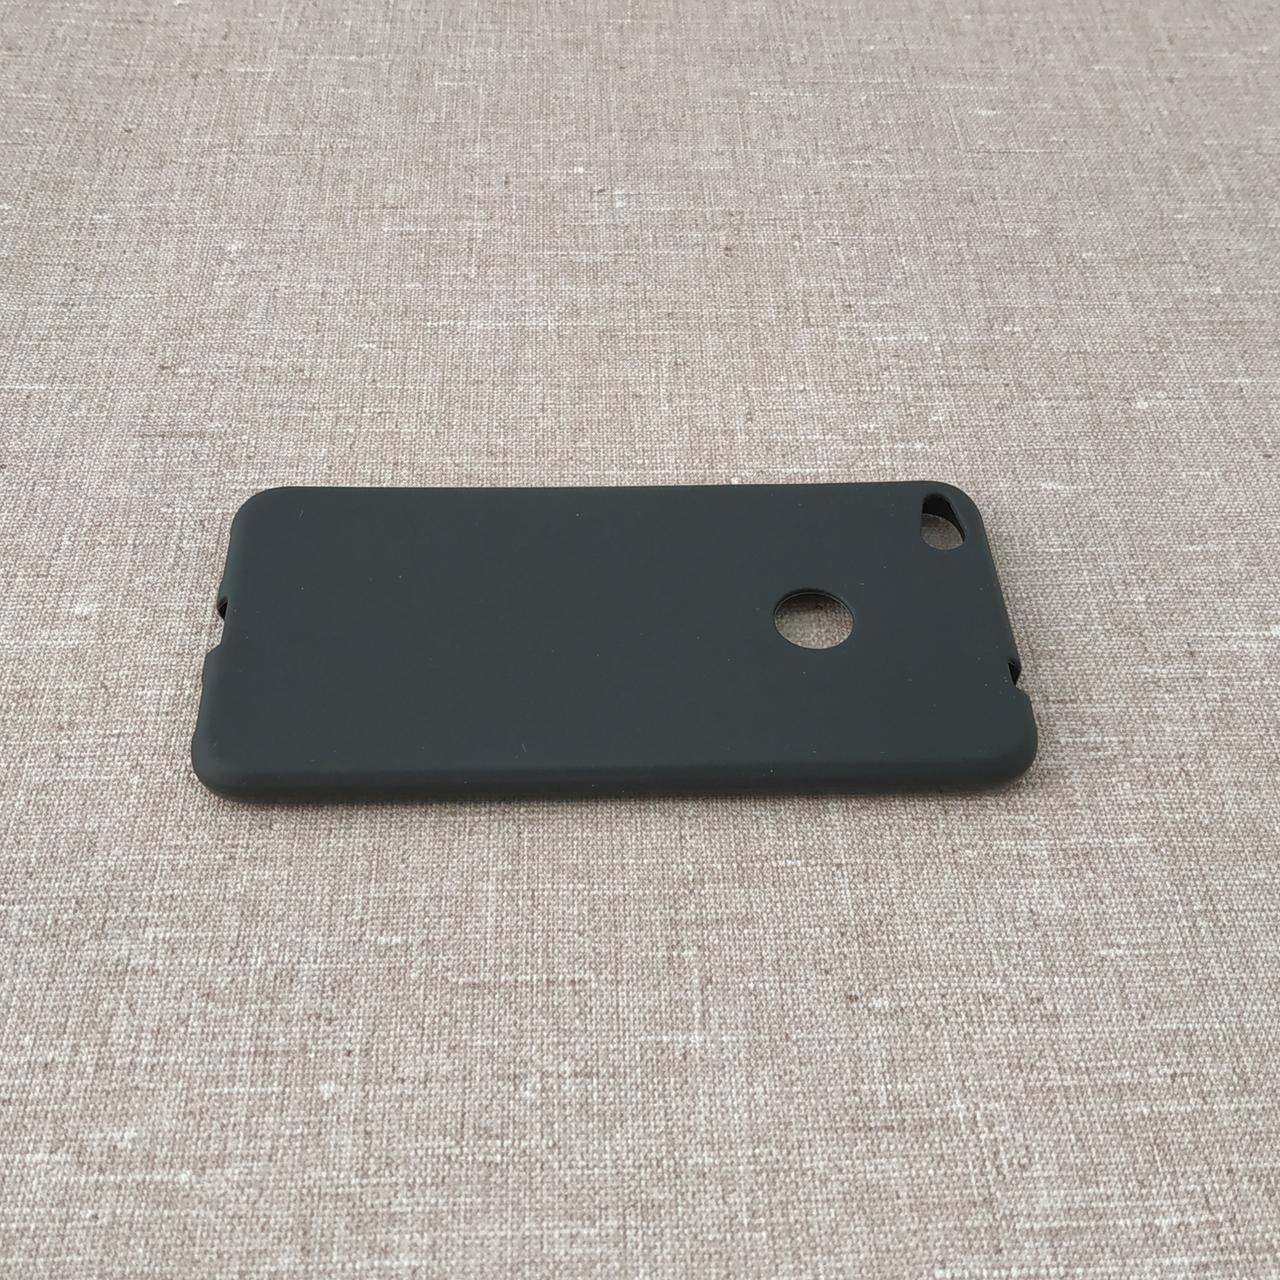 Чехлы для Huawei TPU P8 Lite 2017 black Для телефона